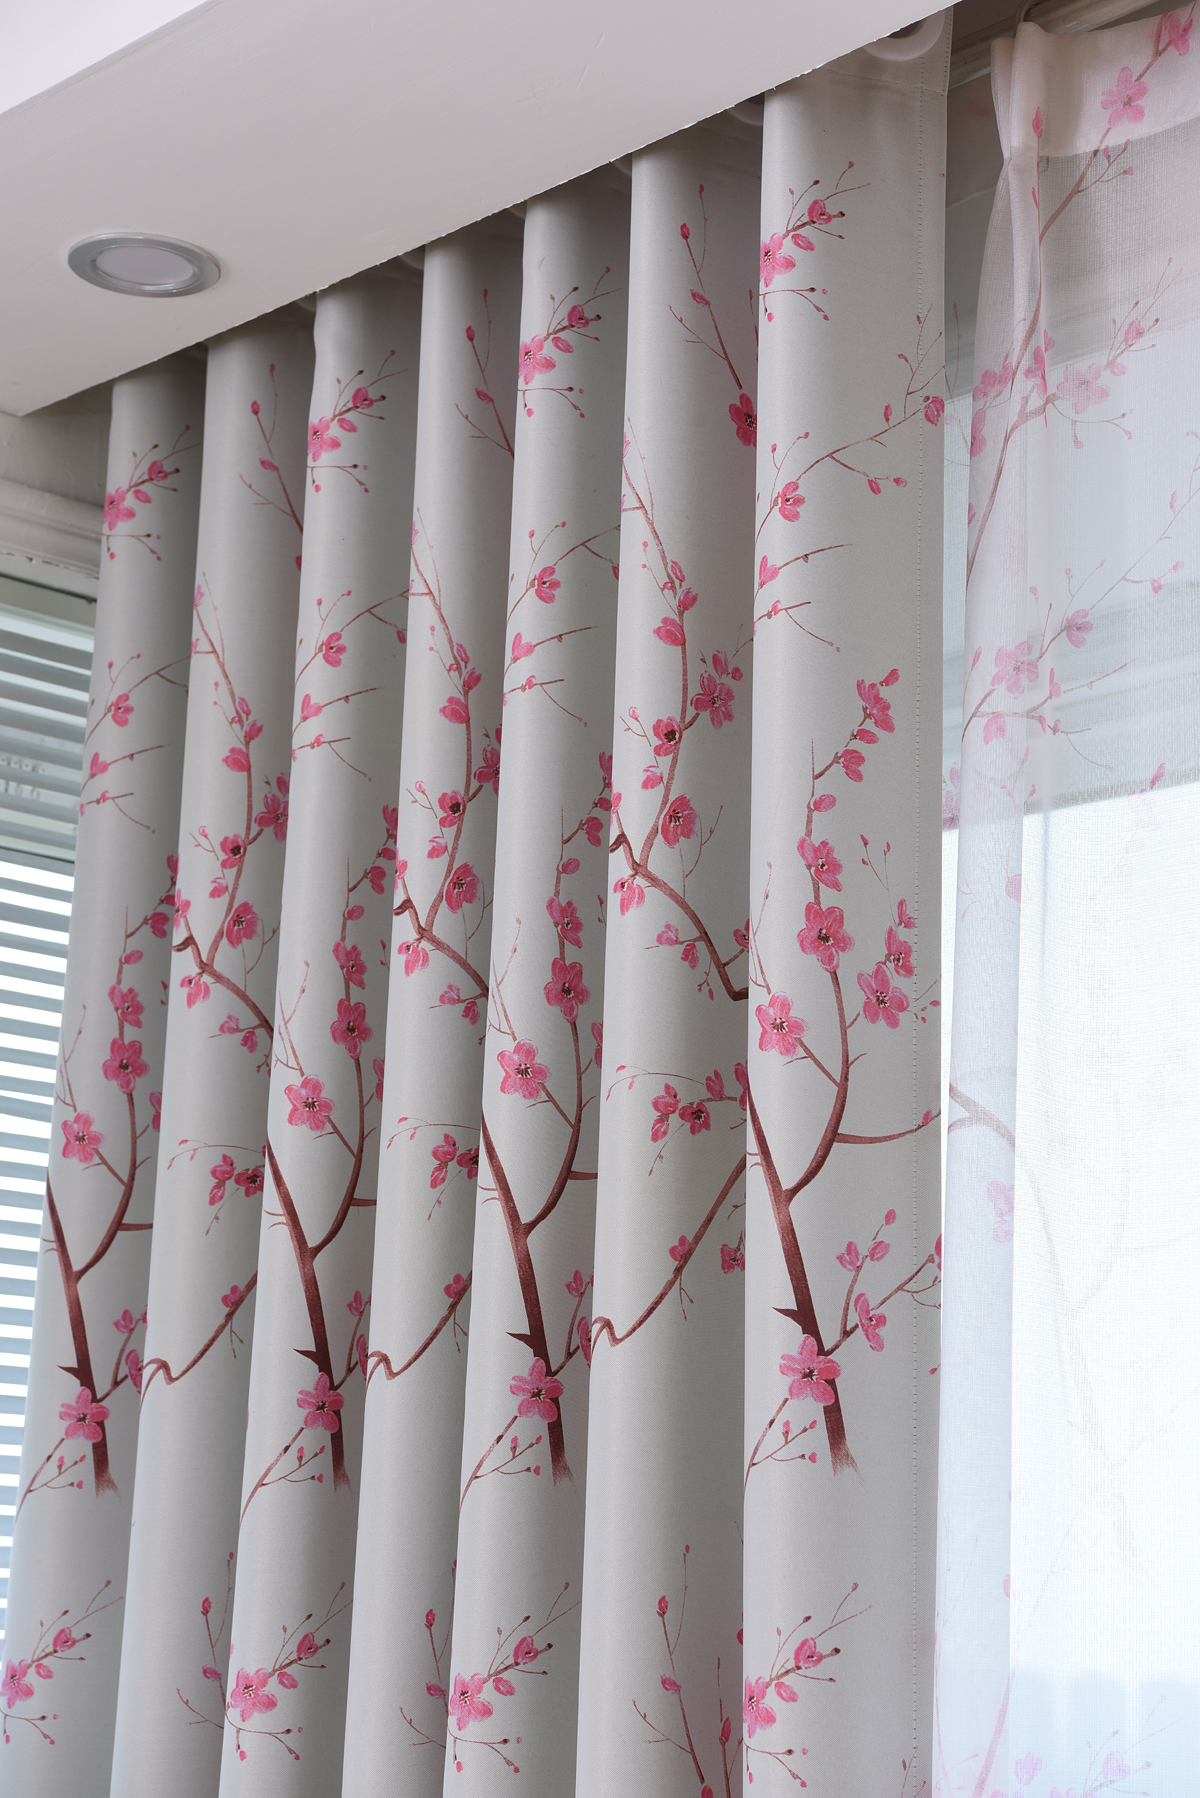 https://ae01.alicdn.com/kf/HTB1fBGtOpXXXXbXapXXq6xXFXXX8/MYRU-Japanse-dorp-stijl-landelijk-gordijnen-perzik-roze-kersenbloesems-schaduwdoek-gordijnen-slaapkamer-en-woonkamer.jpg